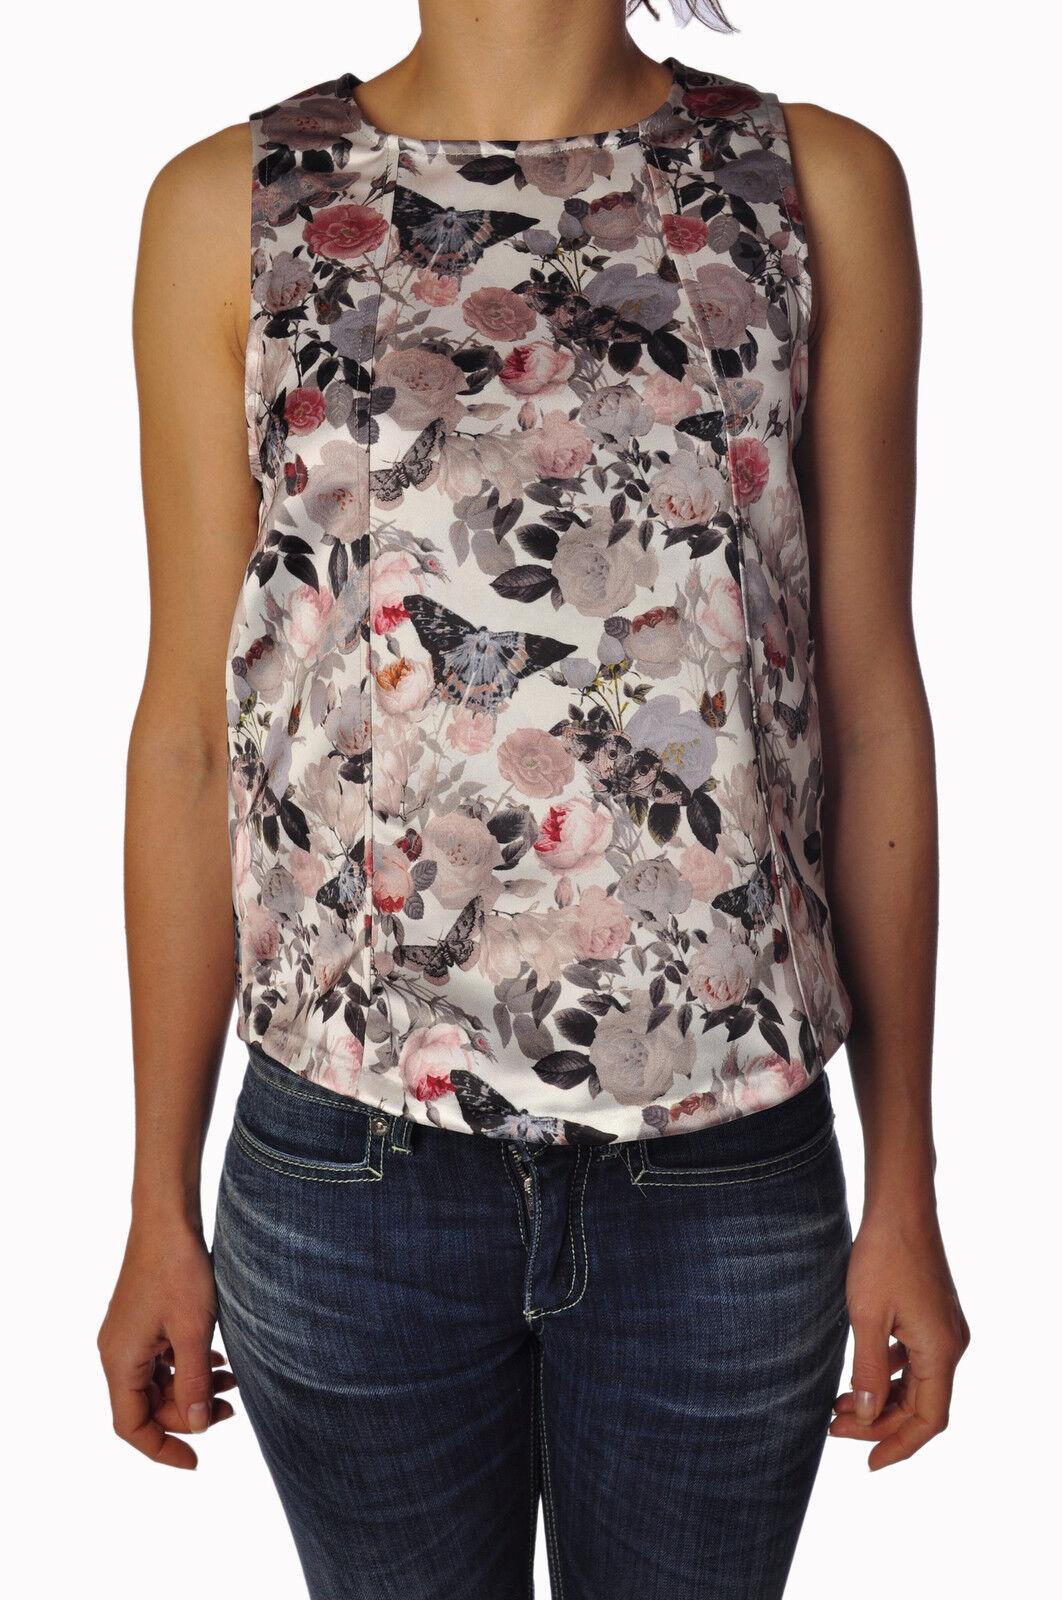 Mercì - Topwear-Sleeveless Top - woman - grau - 786217C184404